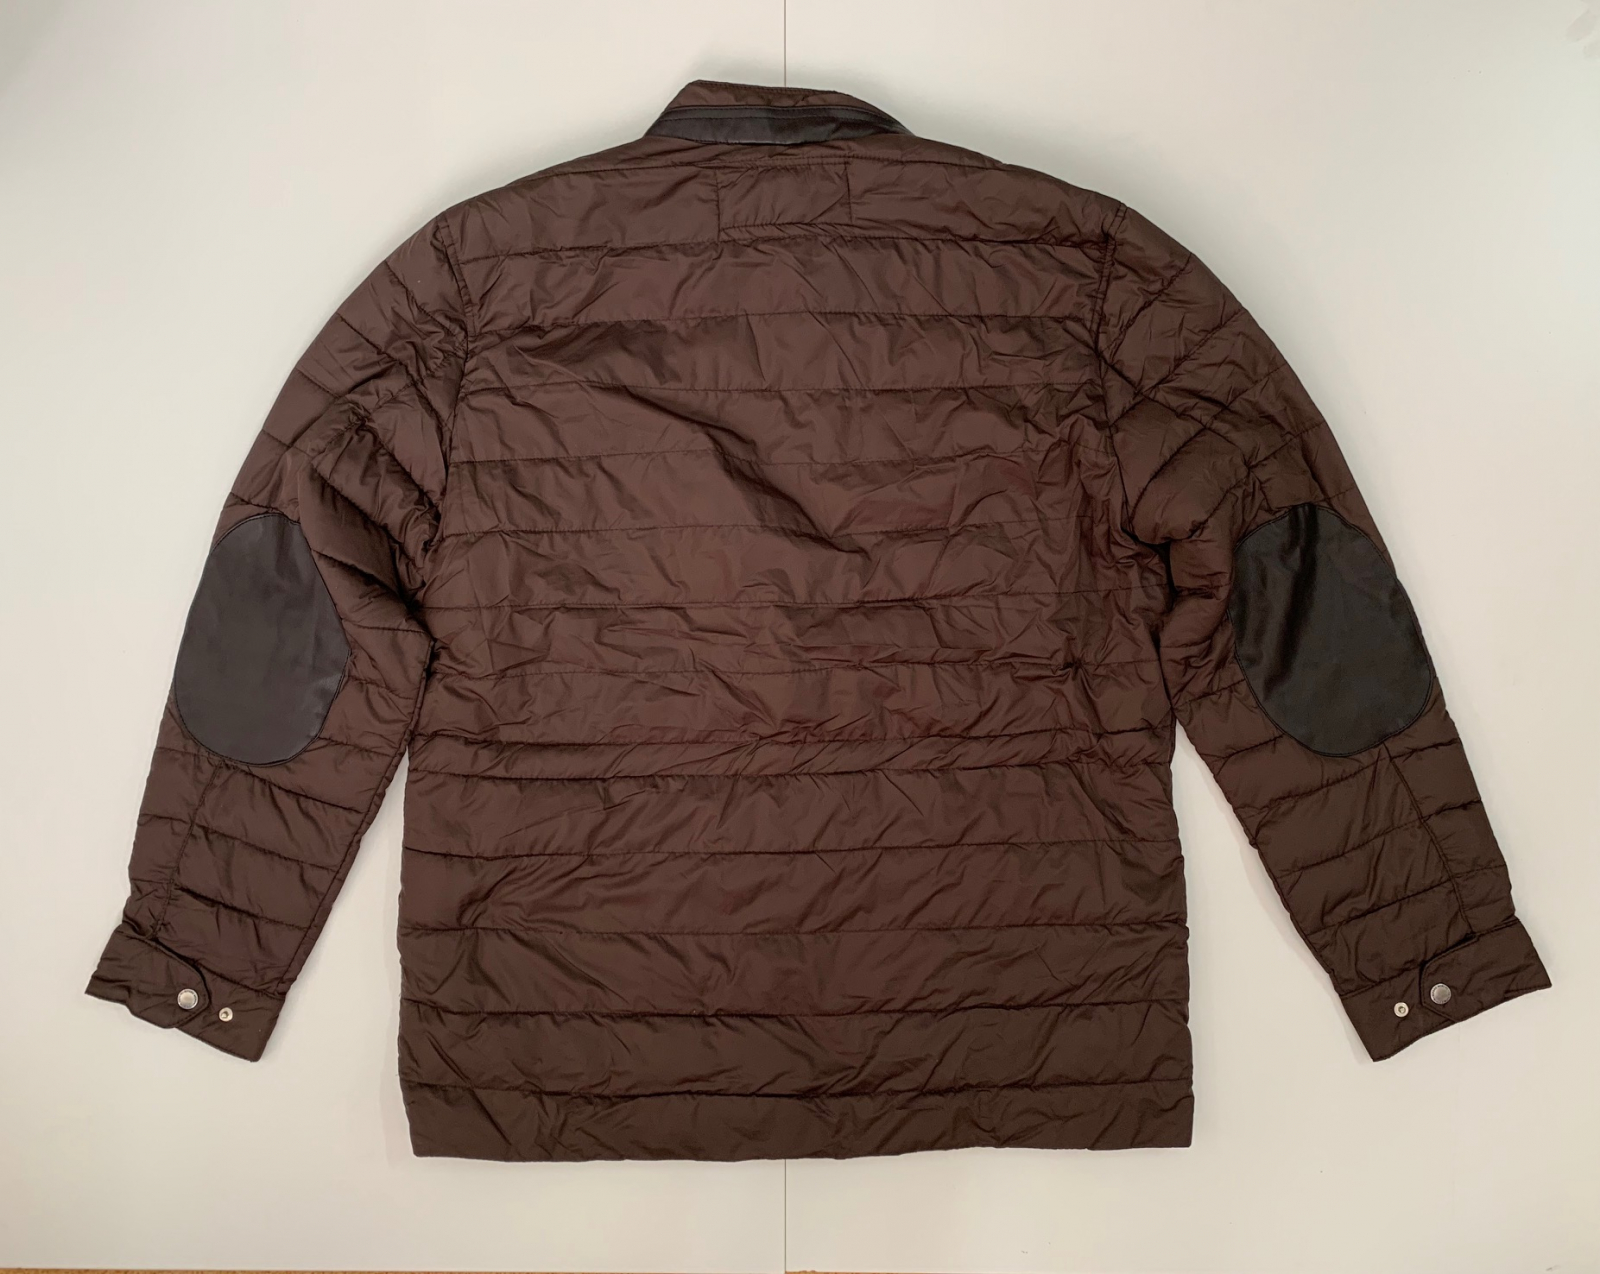 Крутая мужская куртка от ALVARO MORENO